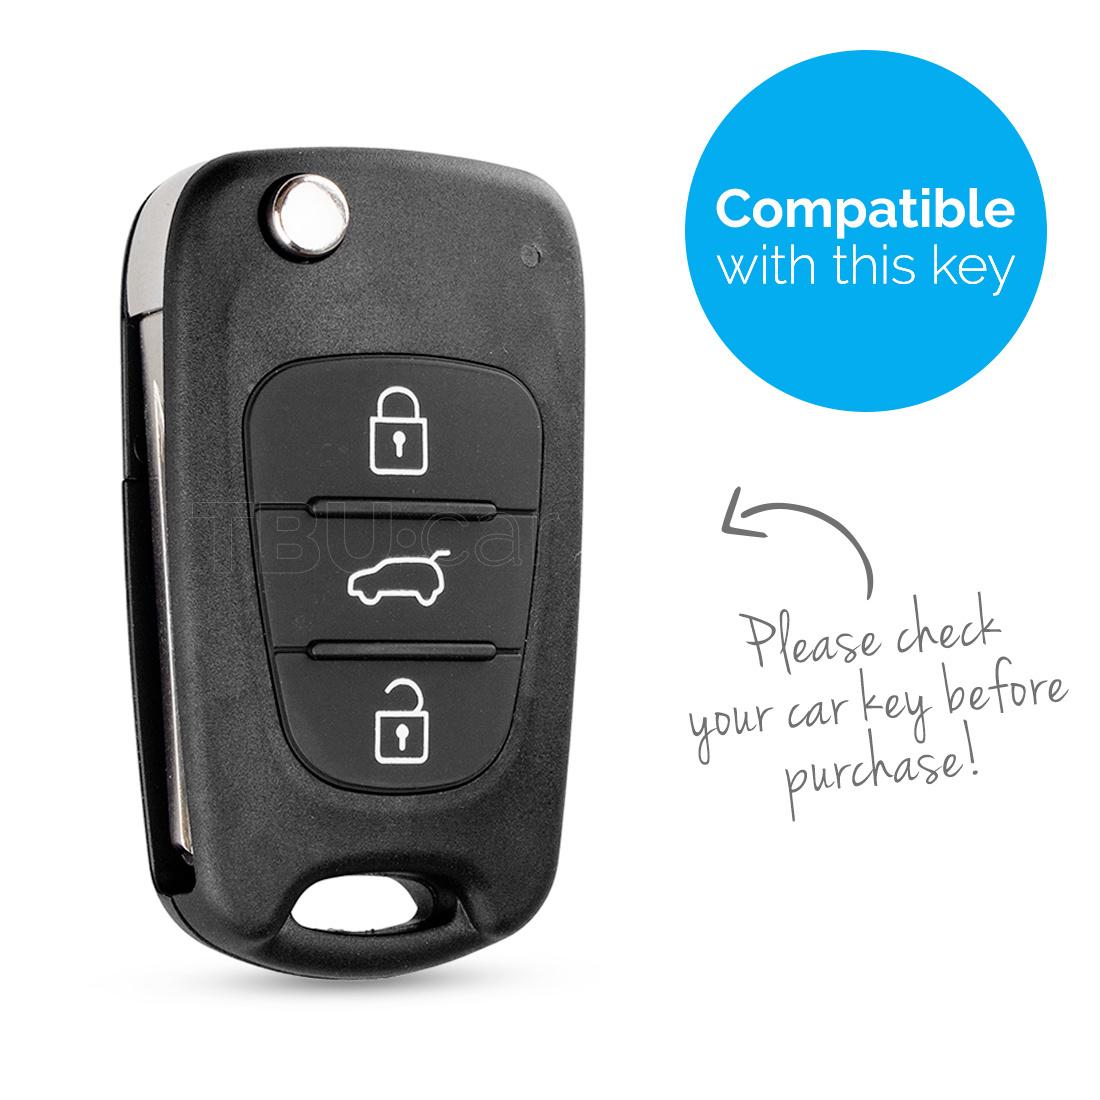 TBU car TBU car Autoschlüssel Hülle kompatibel mit Kia 3 Tasten - Schutzhülle aus TPU - Auto Schlüsselhülle Cover in Roségold